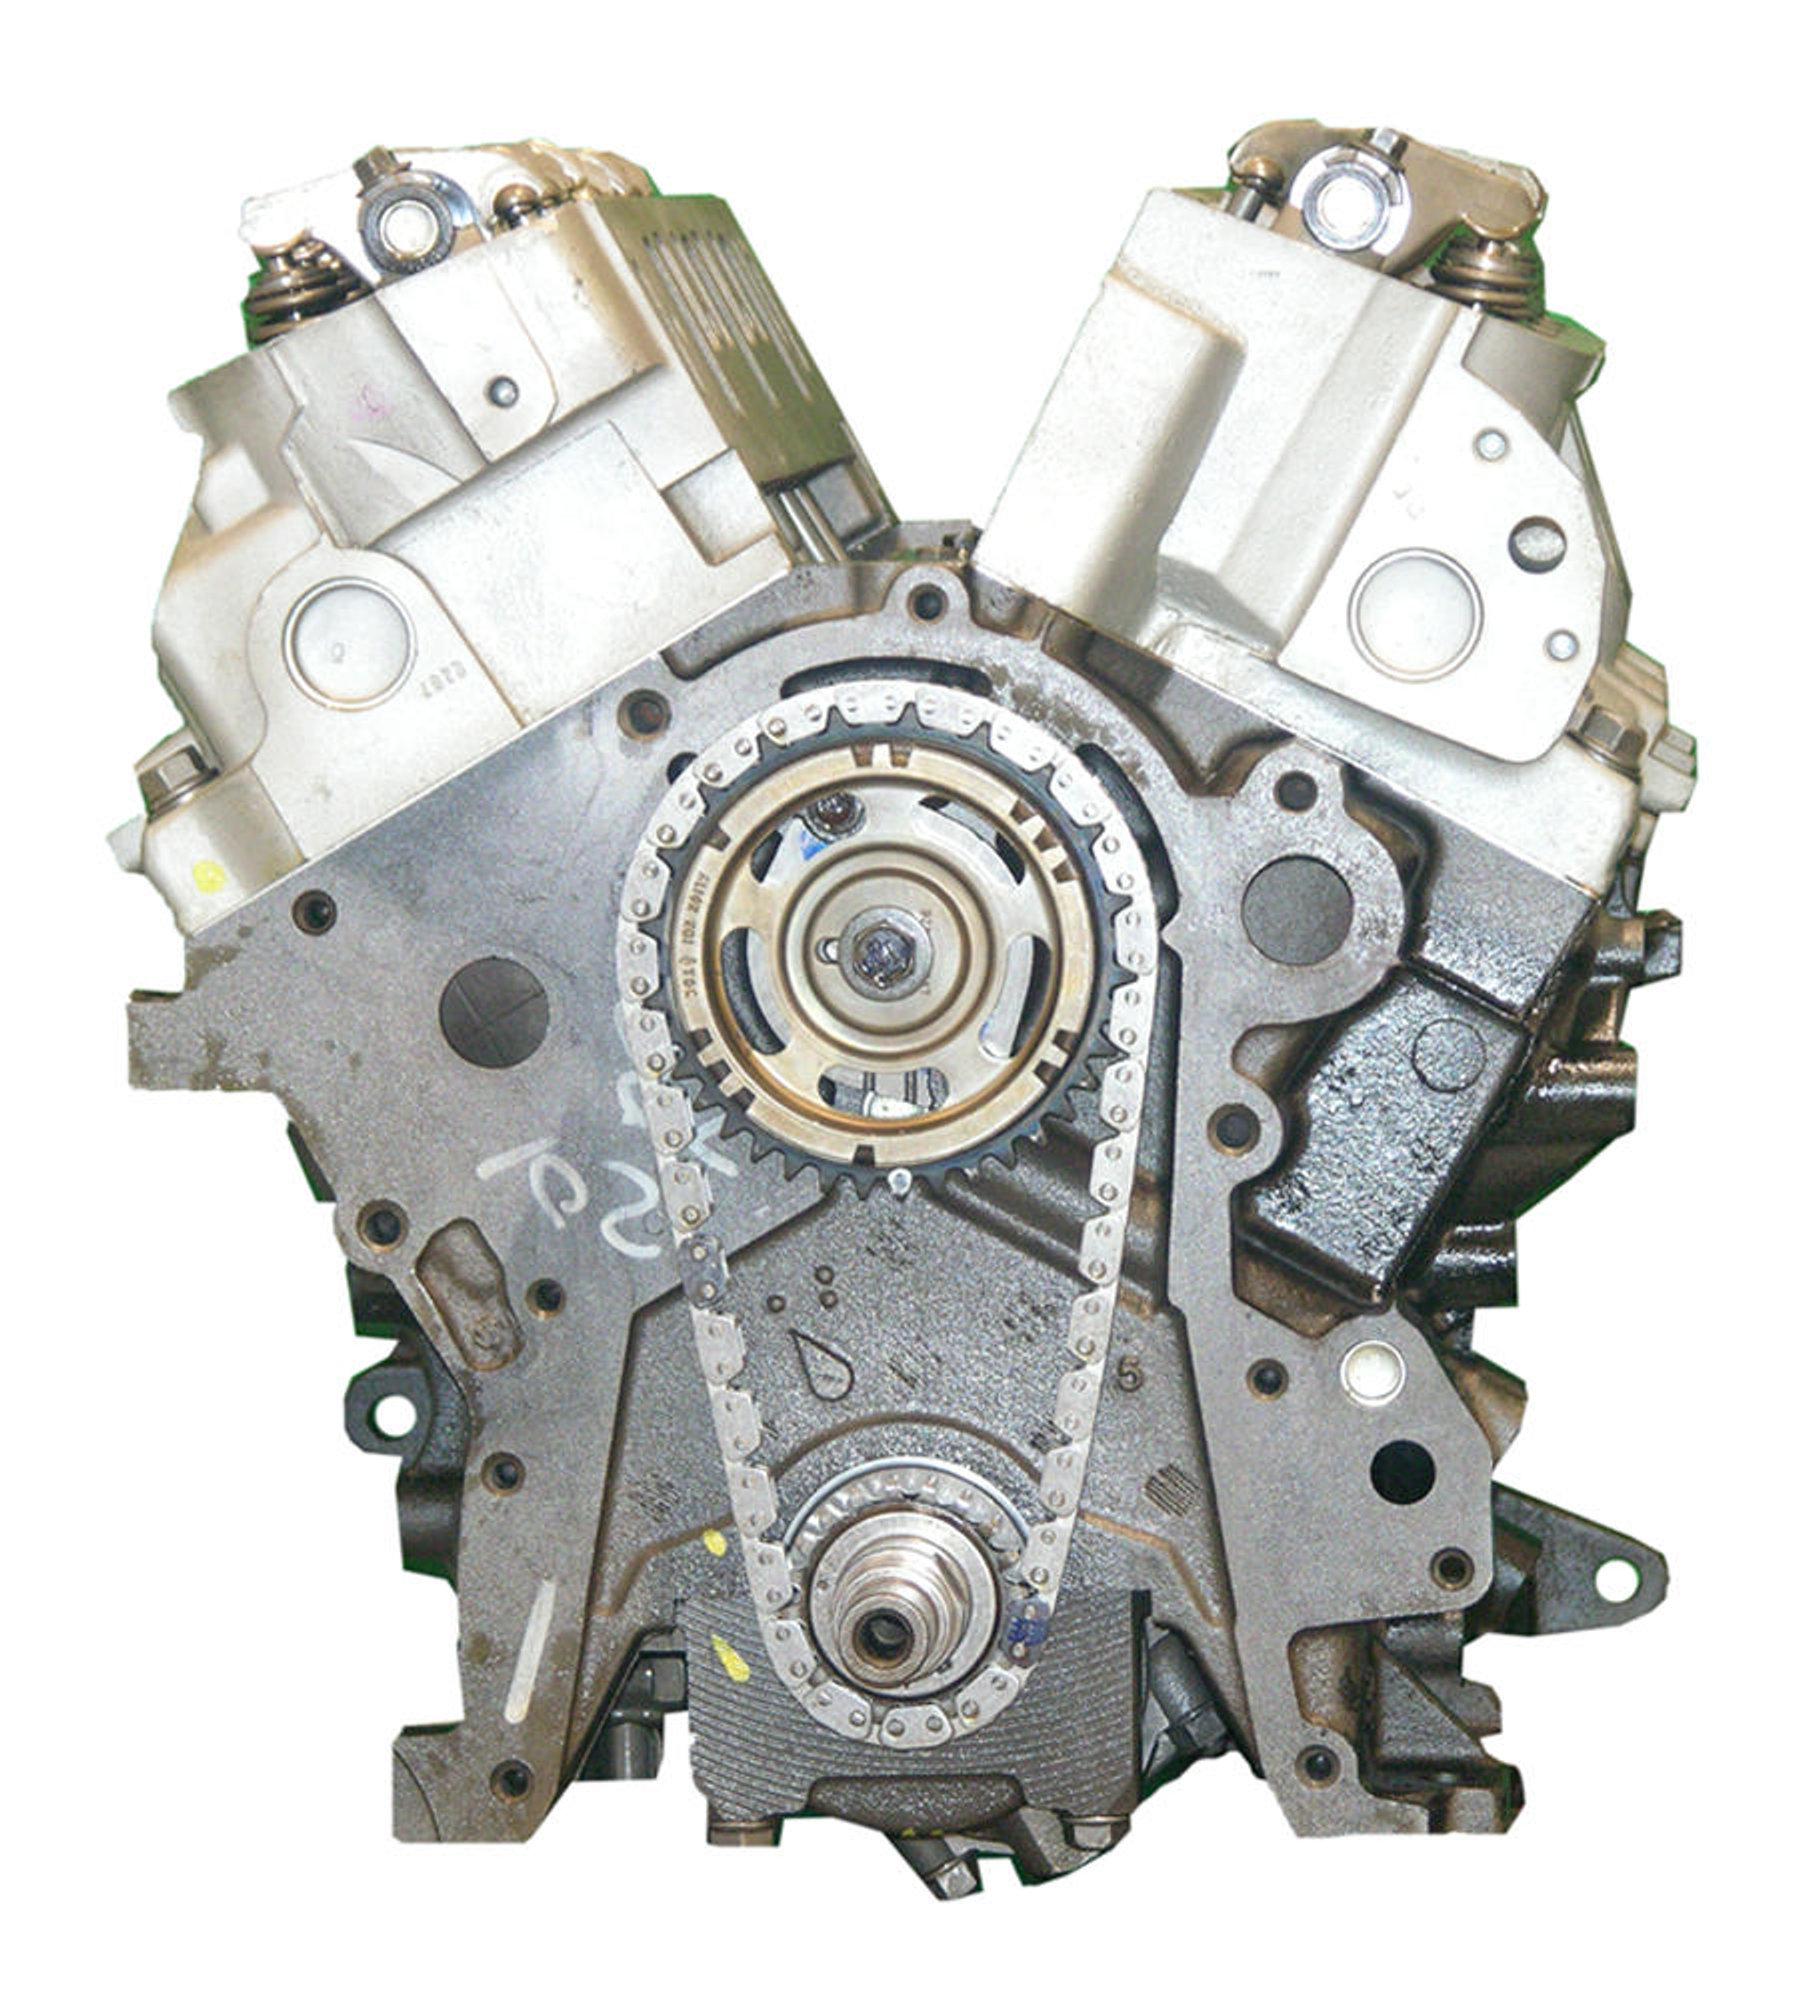 2005-2006 Grand Caravan 3.3-Liter Engine